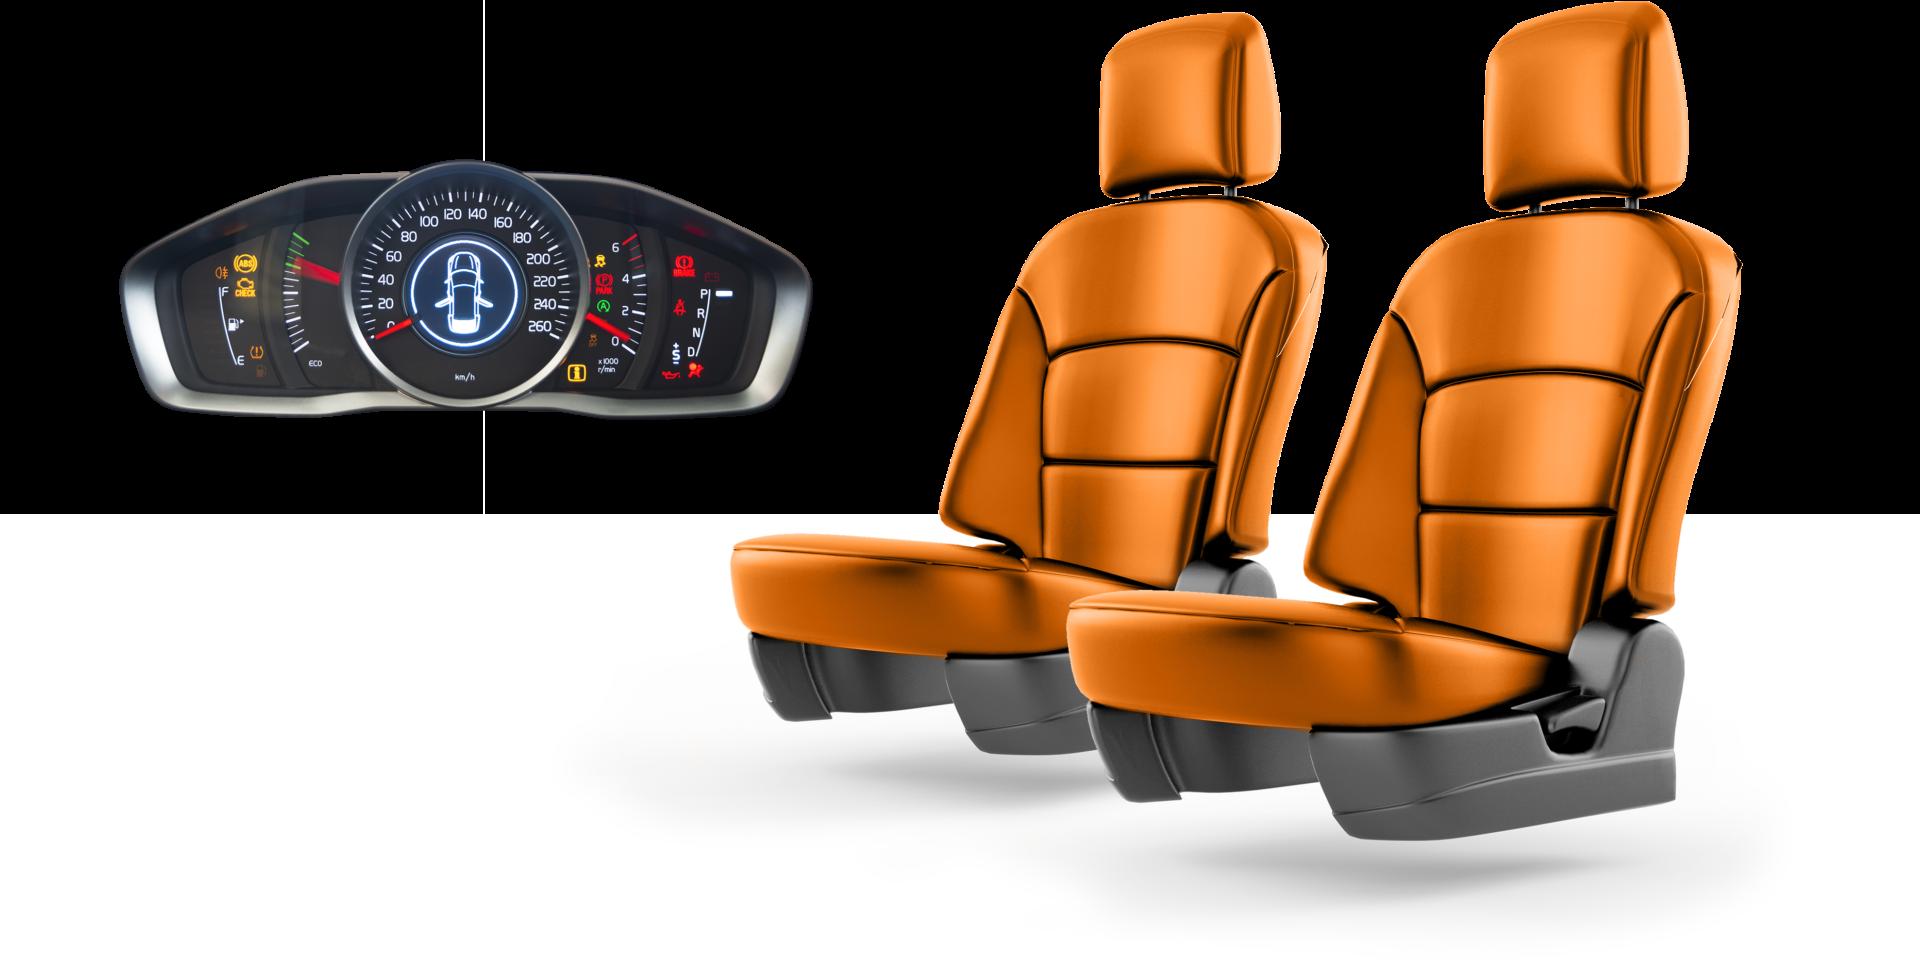 abs-autostoel-dashboard-visual